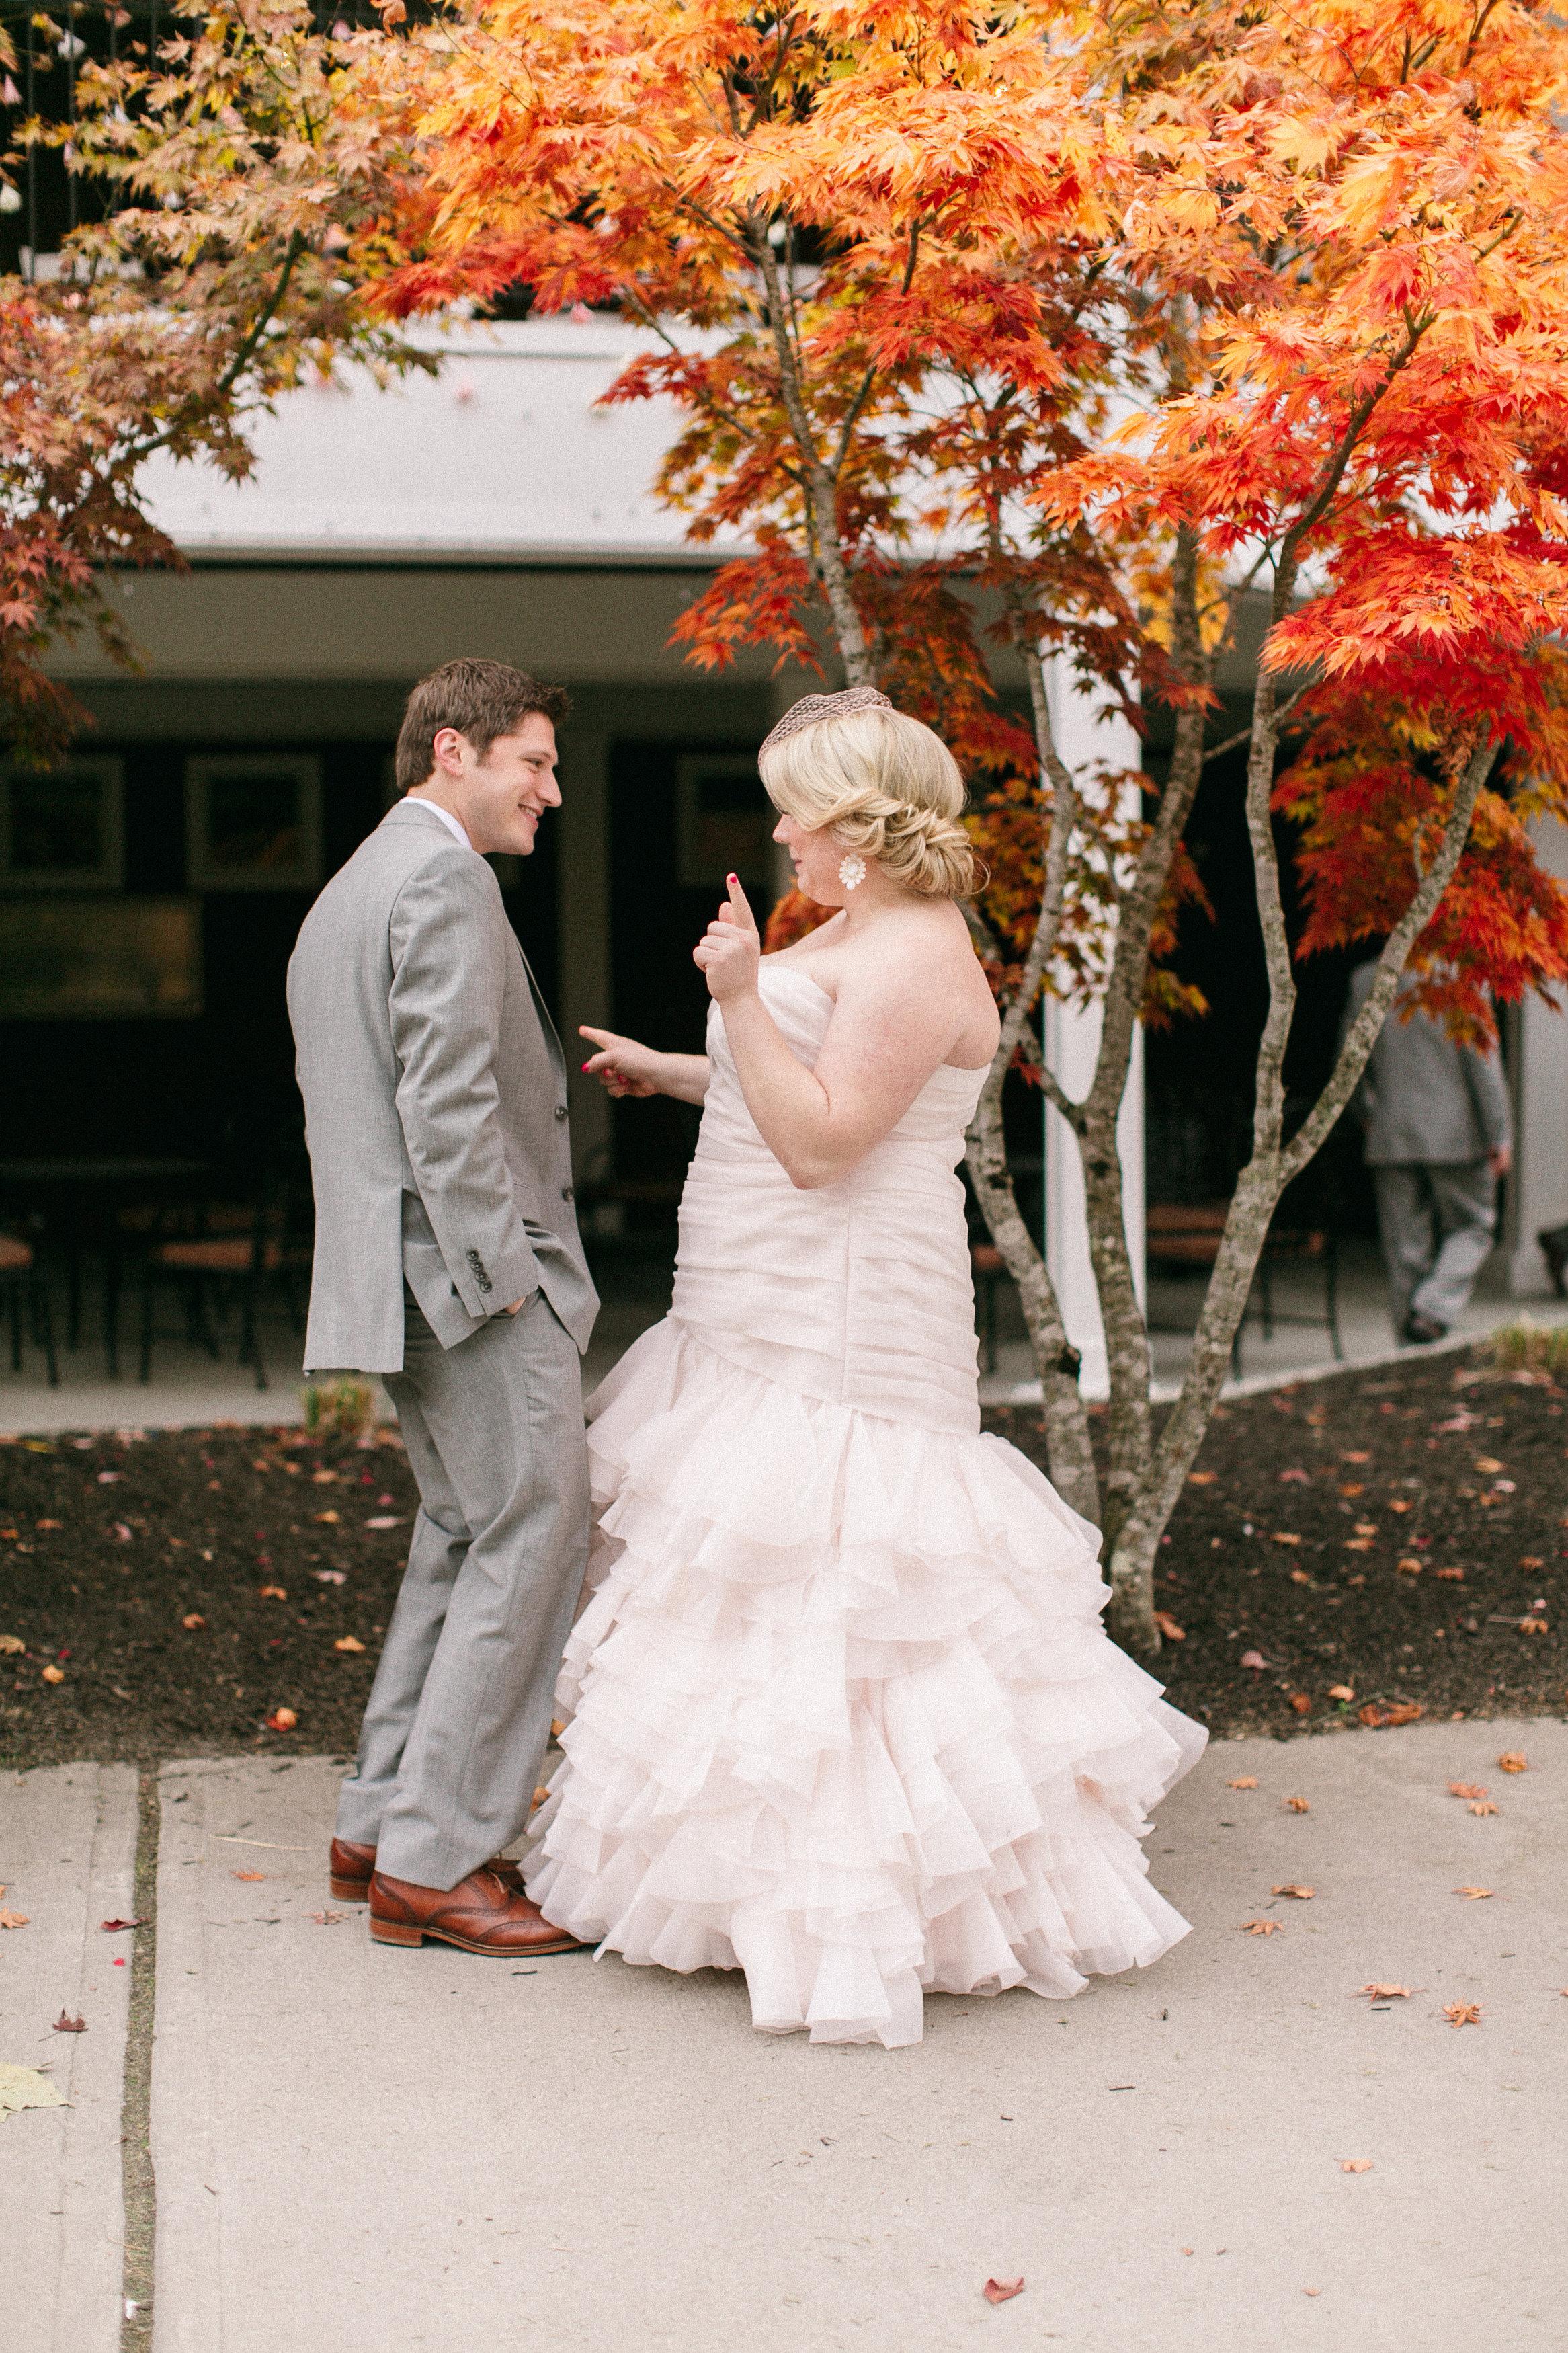 Wedding Photos 0168 Jpg